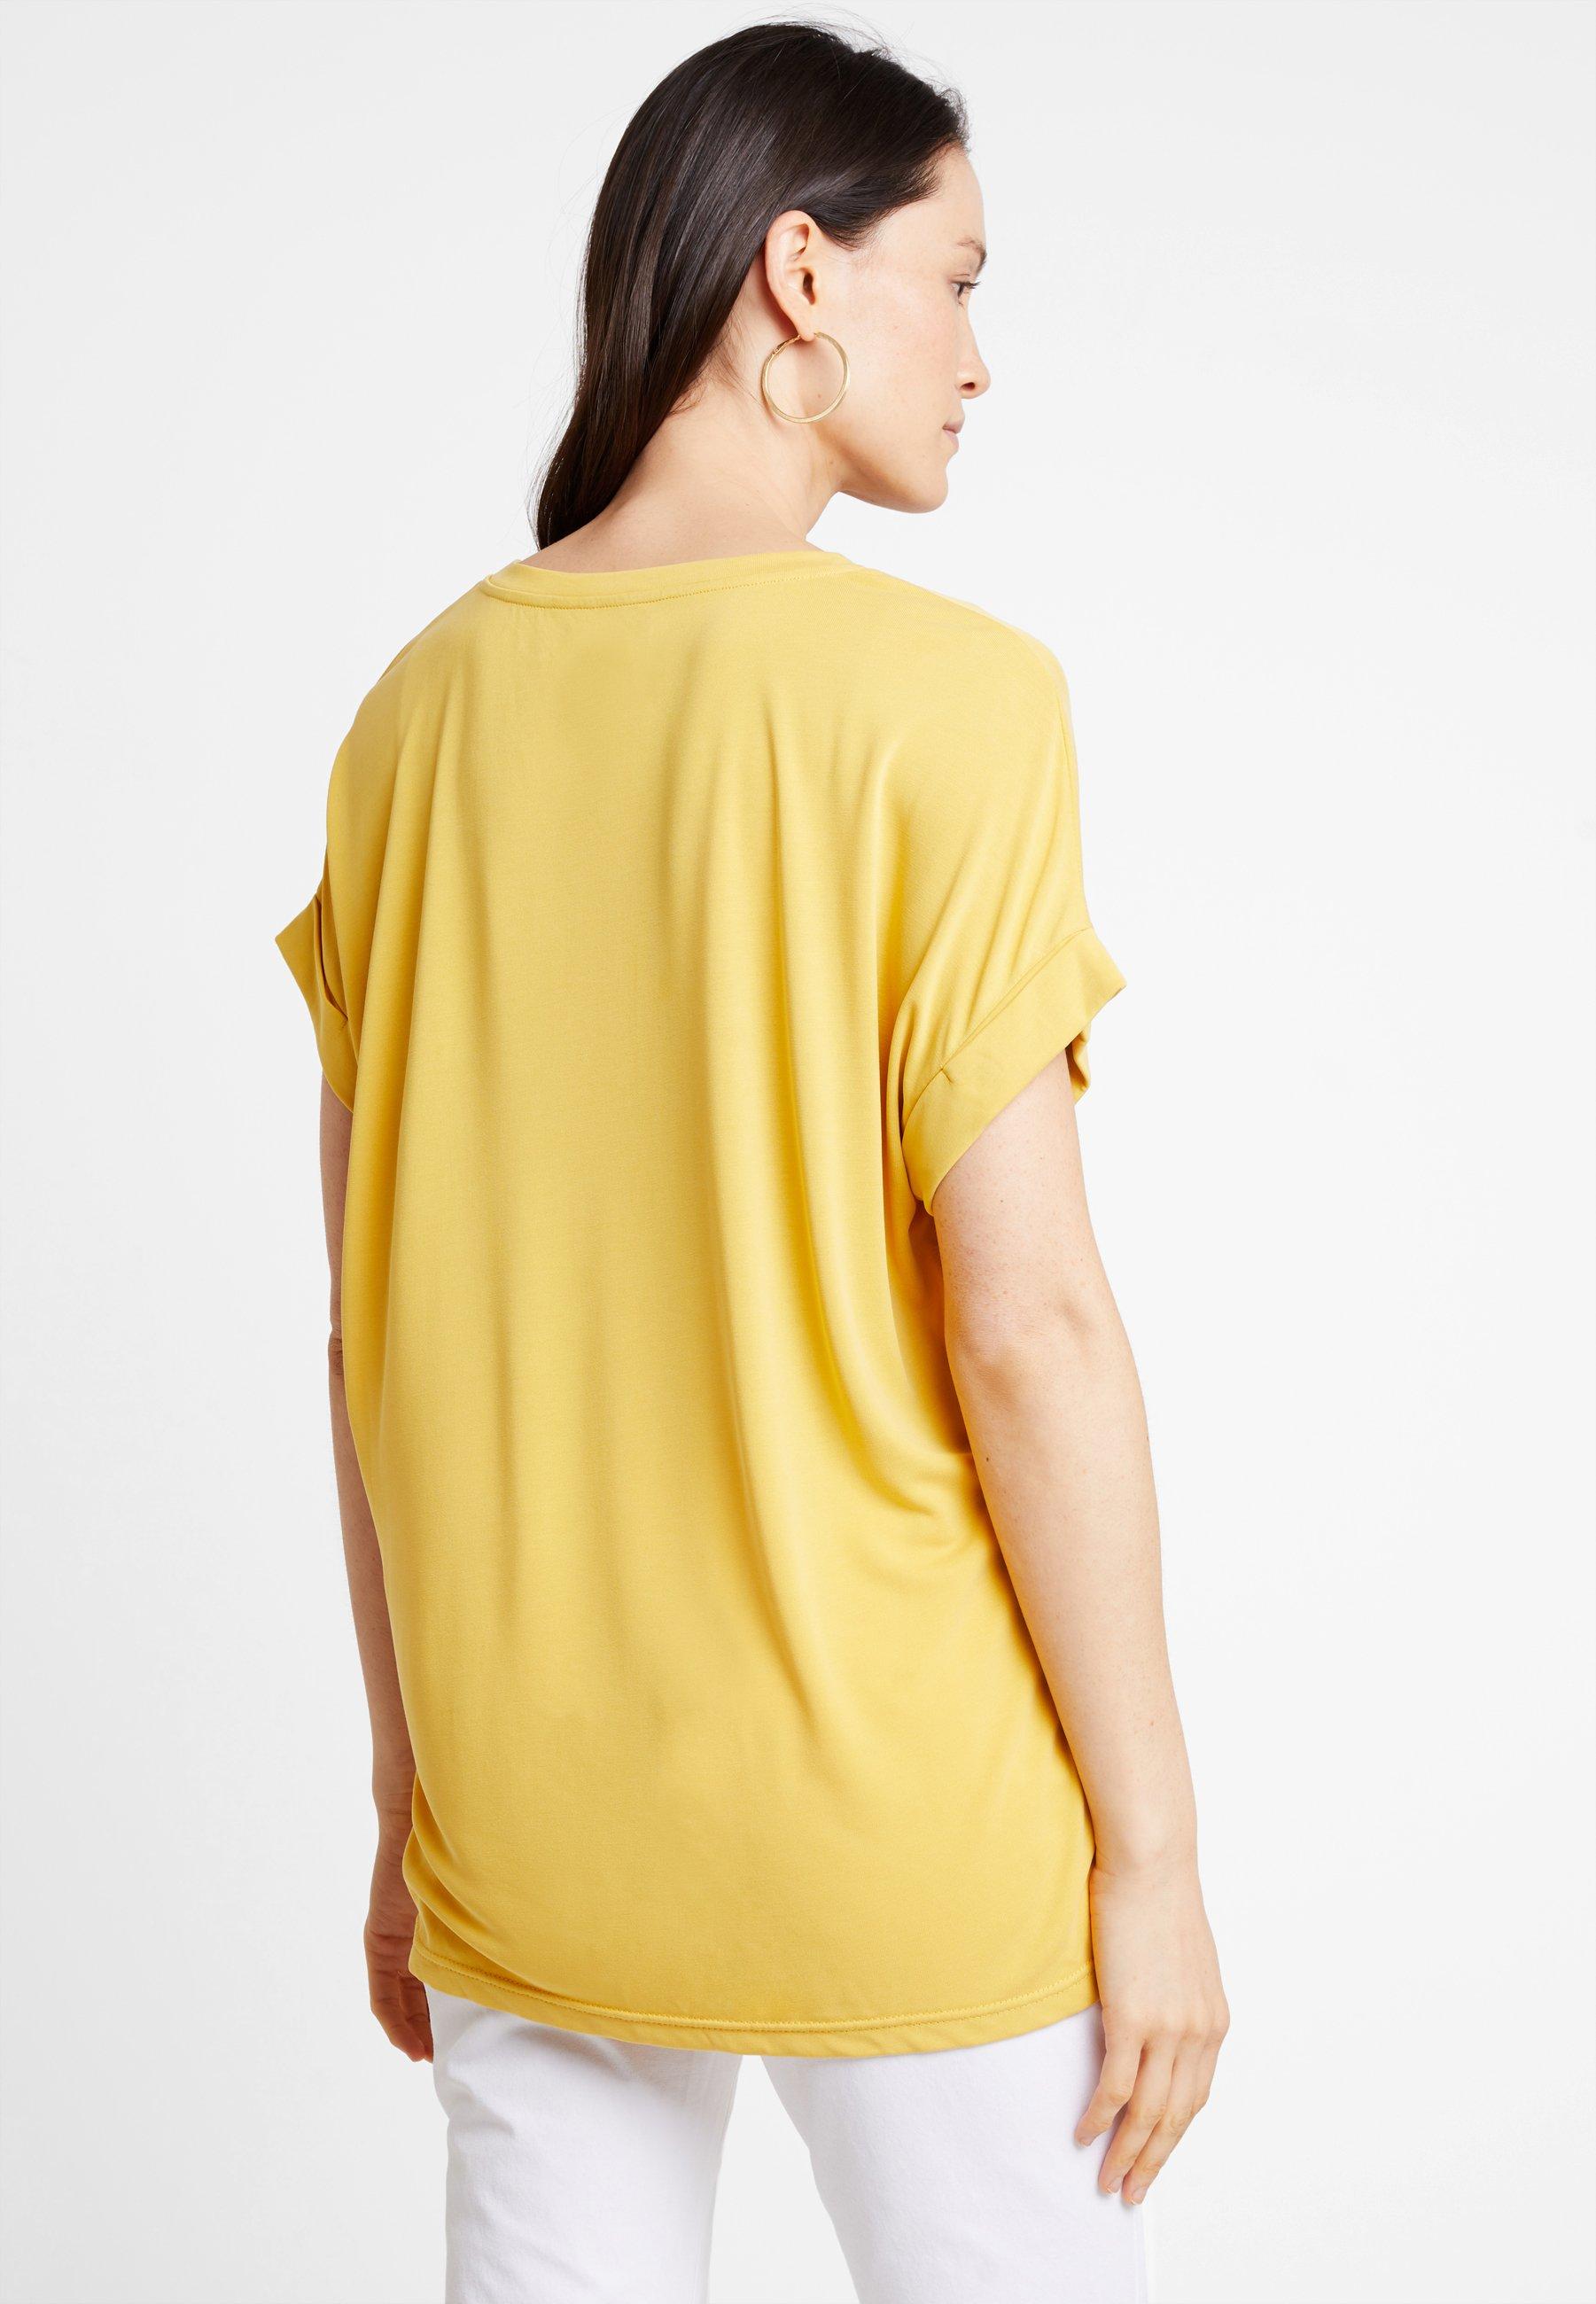 Culture shirt Yellow shirt Culture Yellow Basique KajsaT KajsaT Basique QdCtxrsh